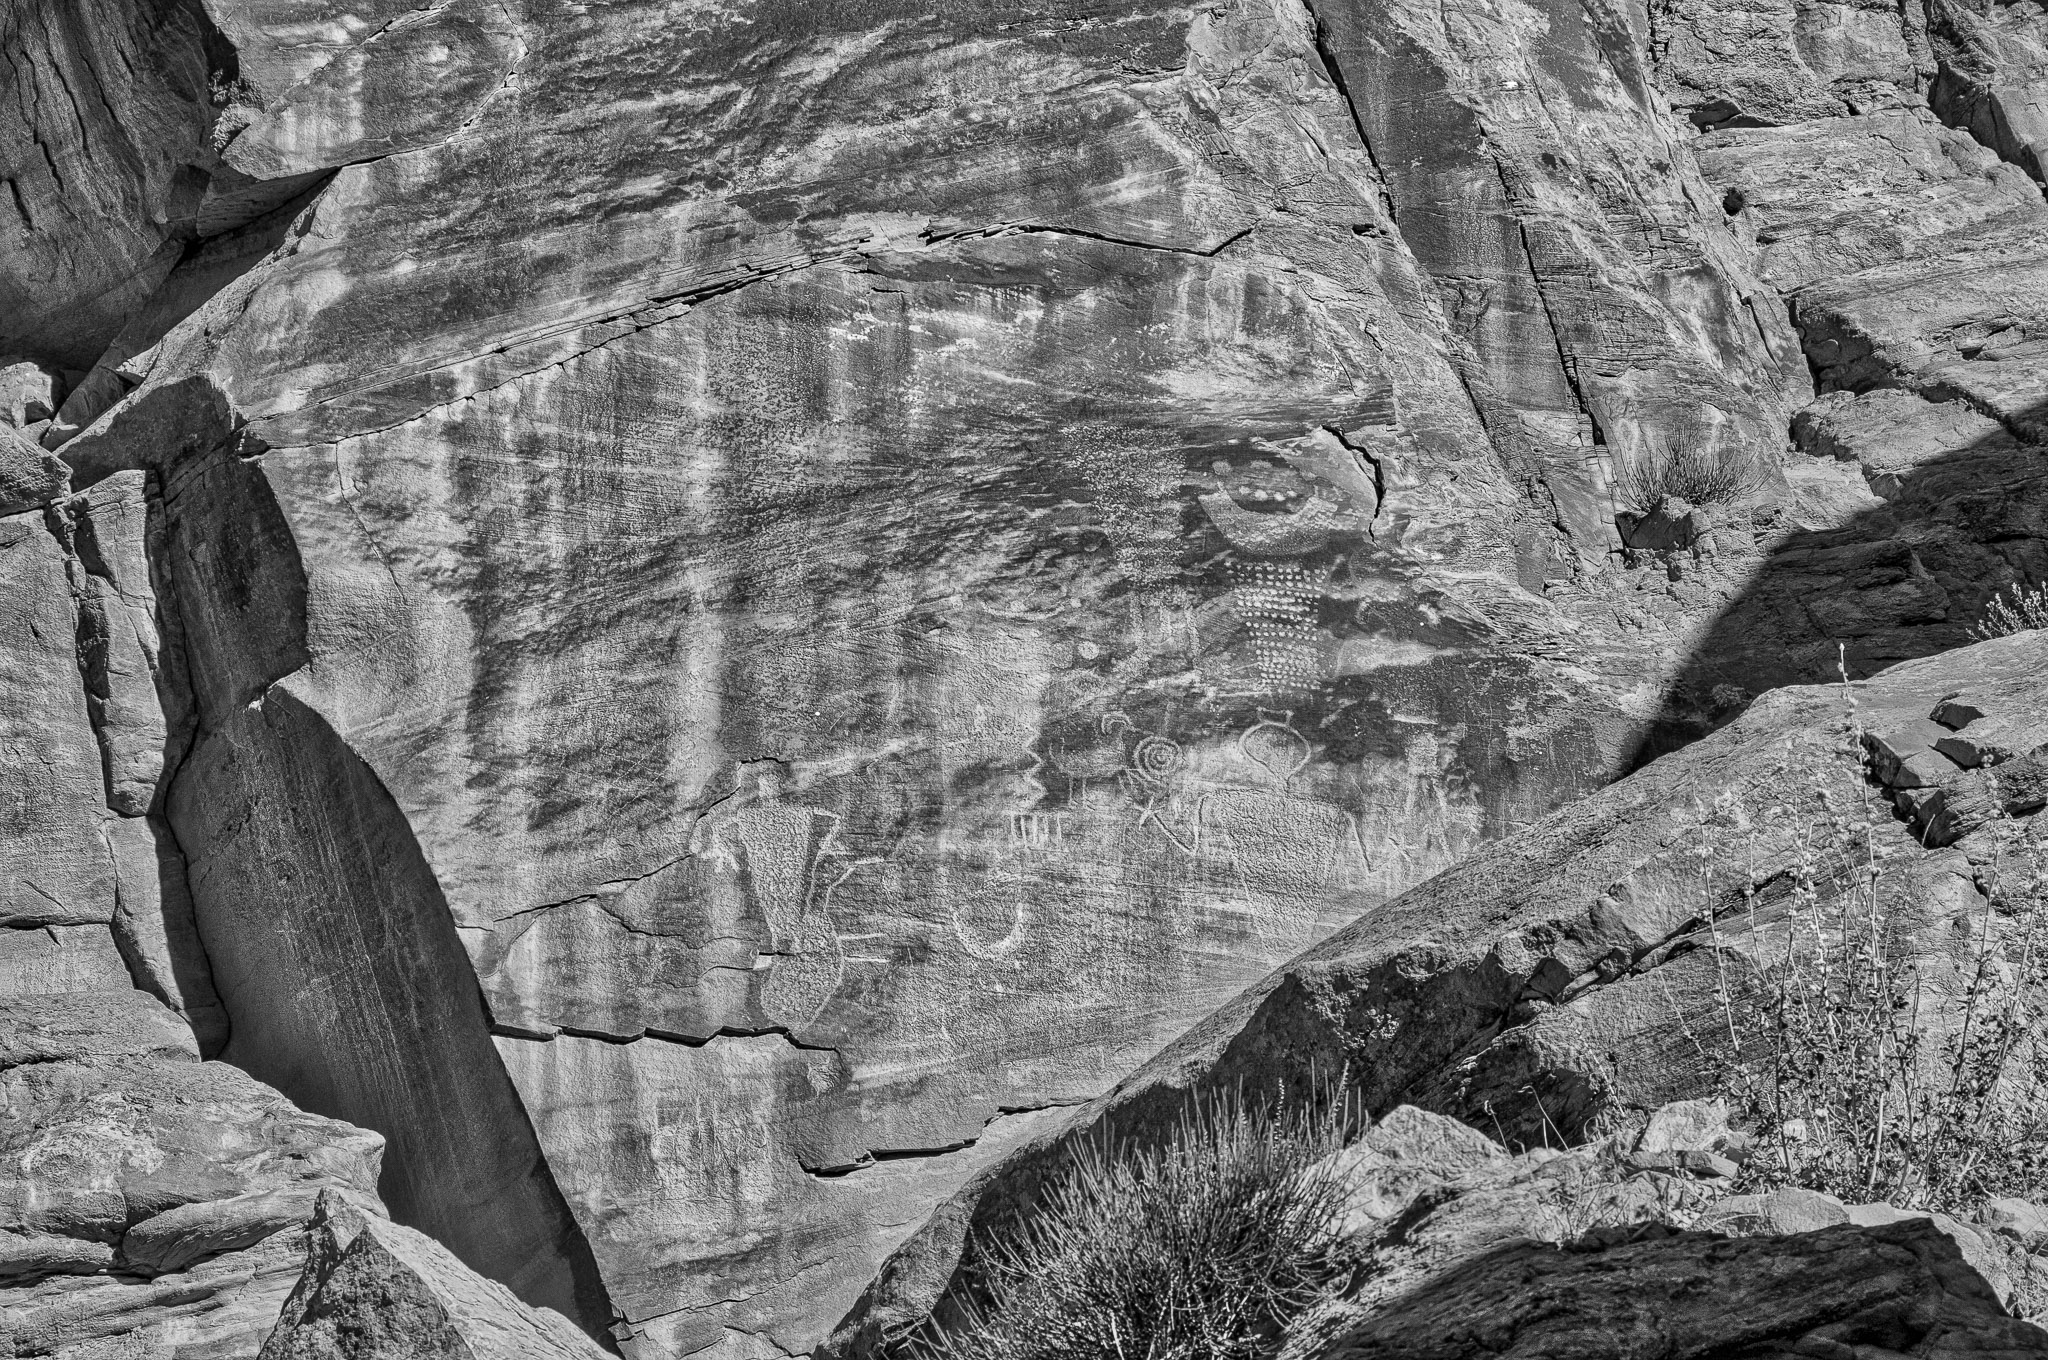 Closeup of petroglyphs on rock overlooking Cub Creek In Dinosaur National Monument.